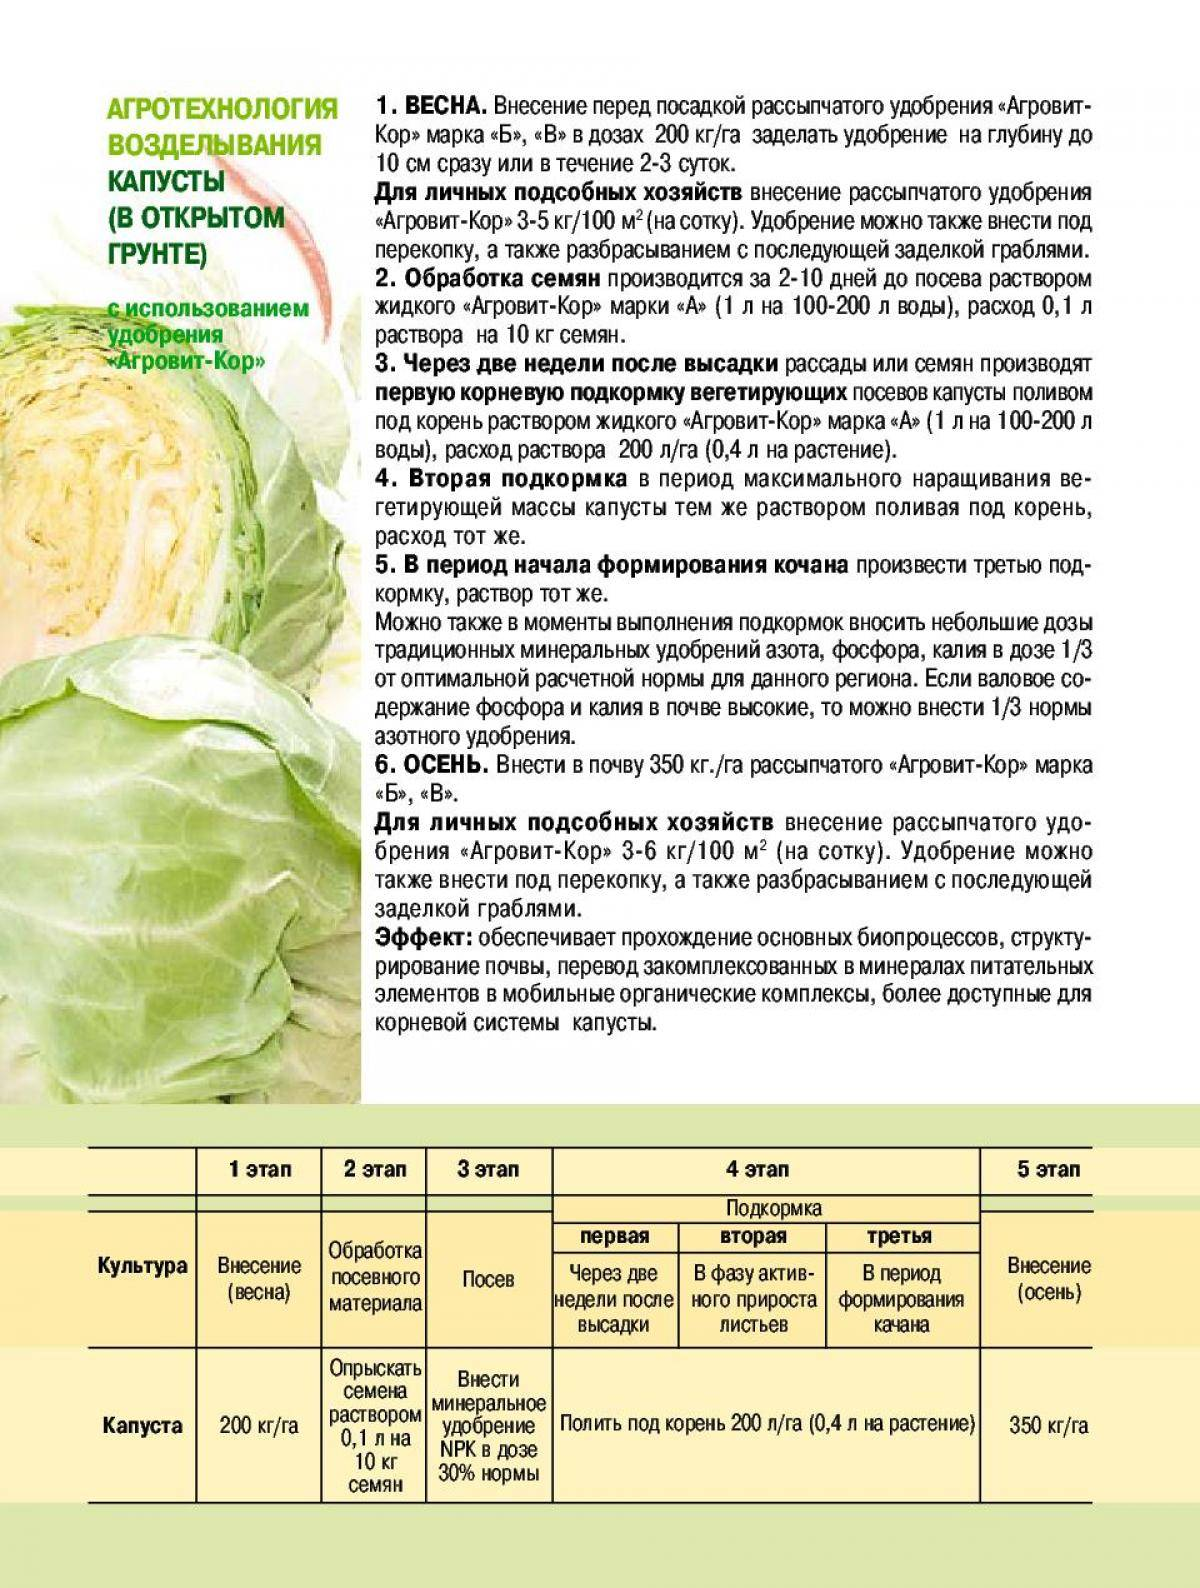 Зола: правила подкормки растений